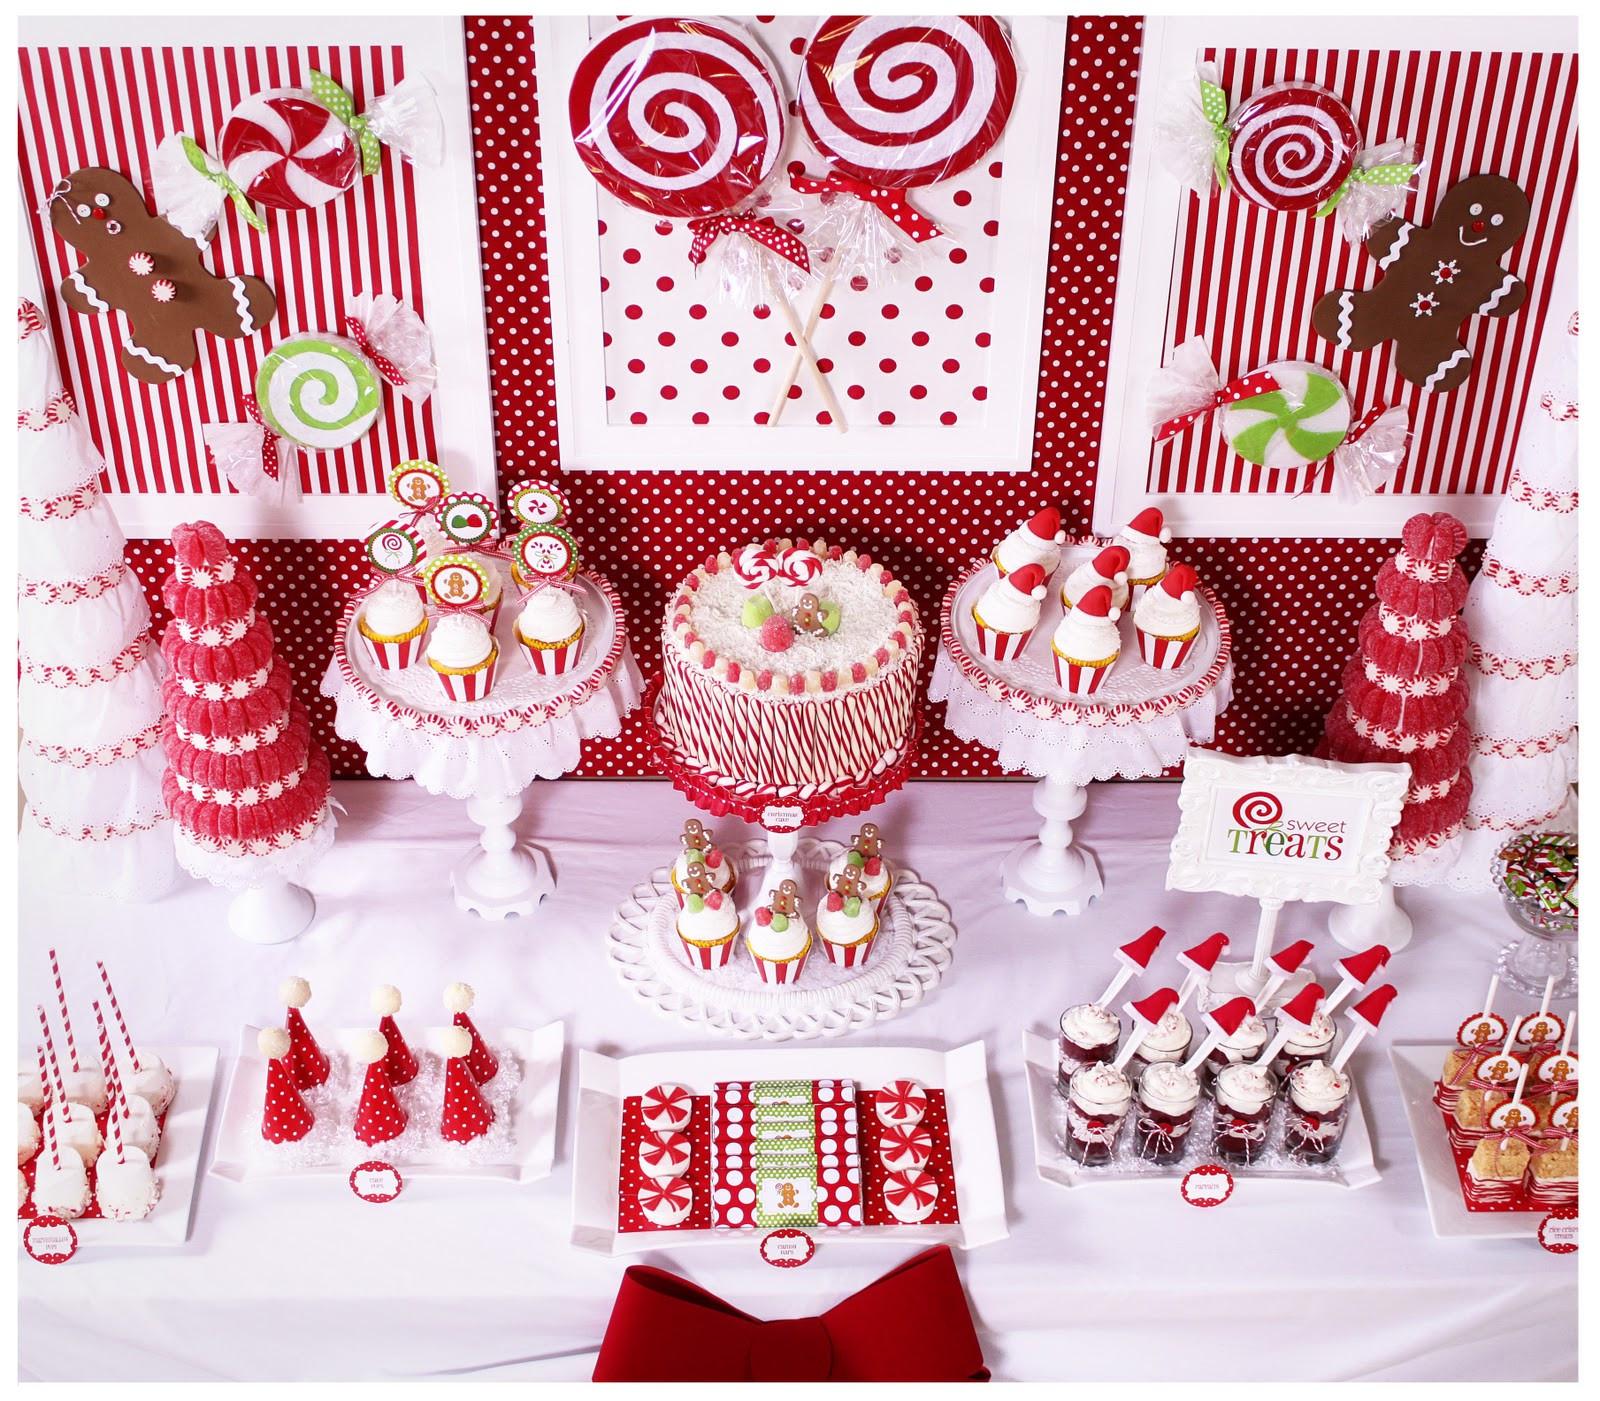 Christmas Party Theme Ideas For Adults  Kara s Party Ideas Candy Land Christmas Party